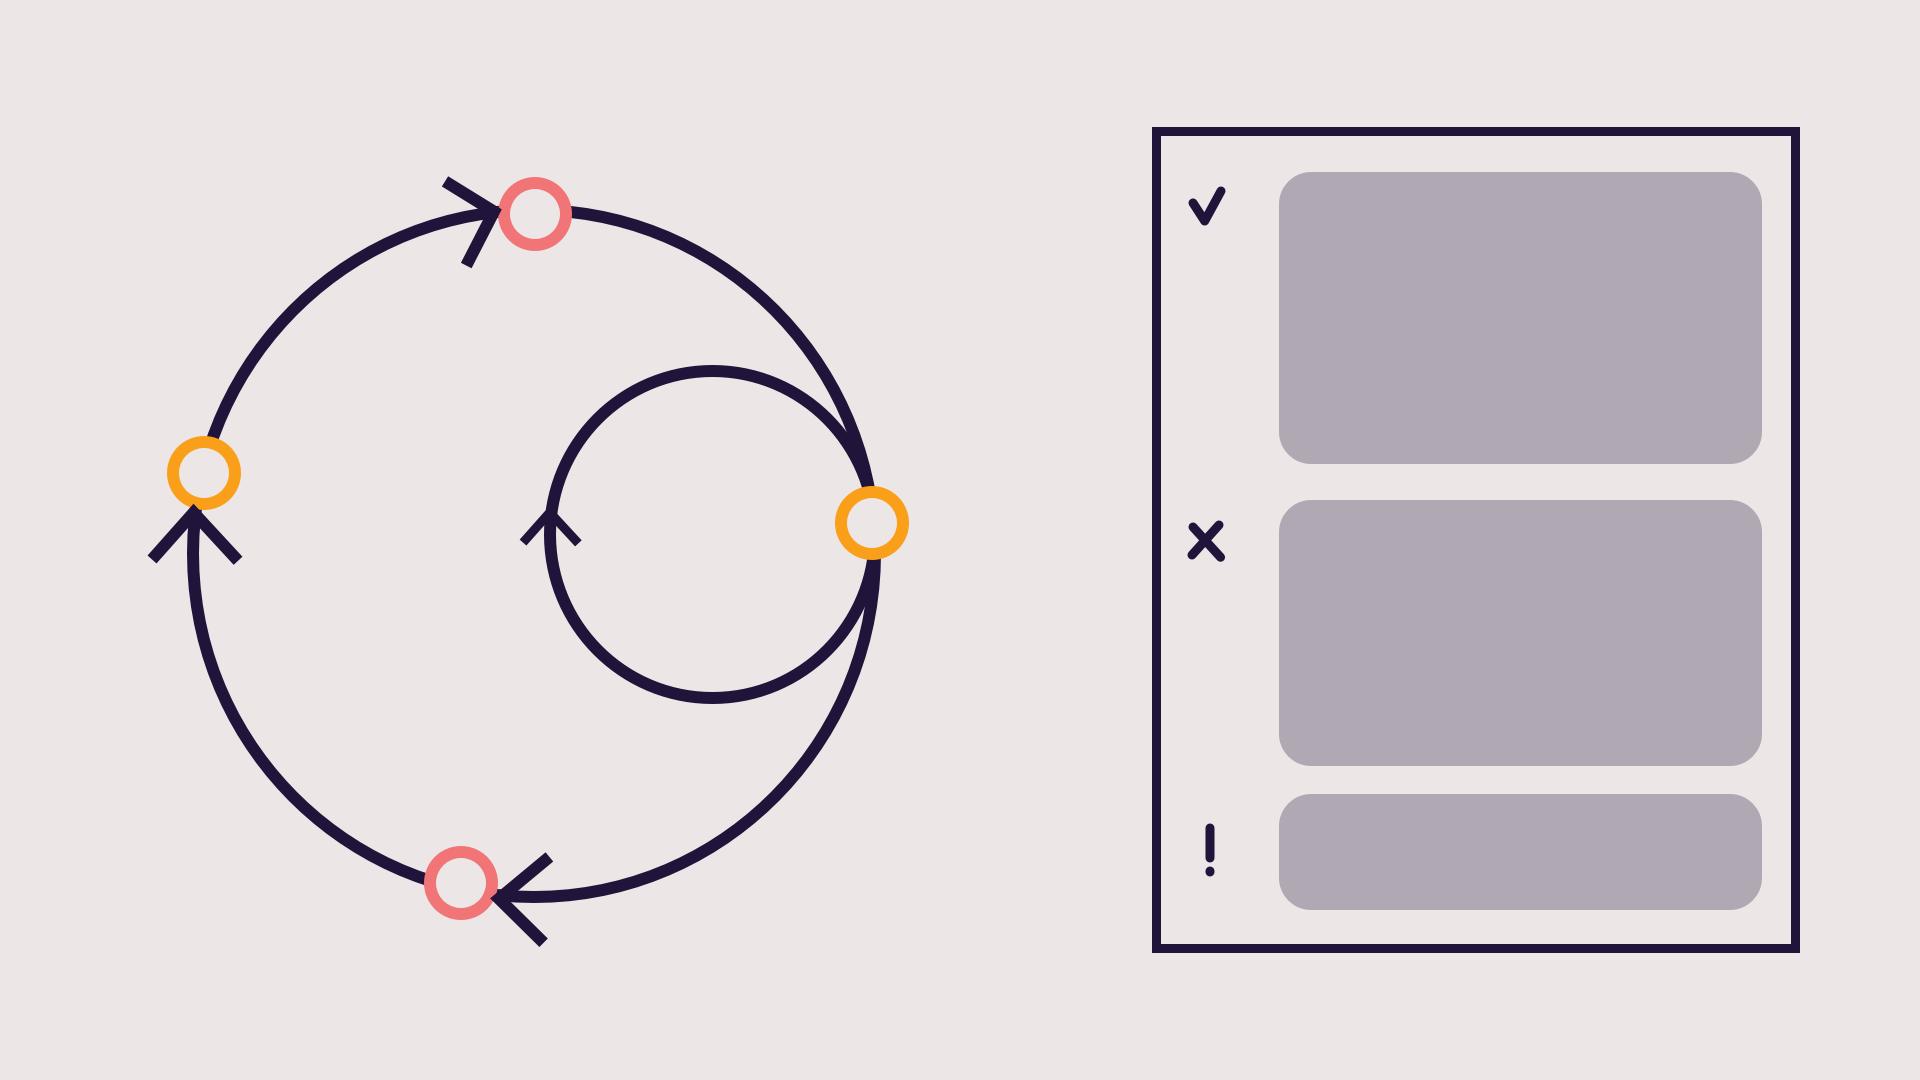 4_3_Diagram_Result.png